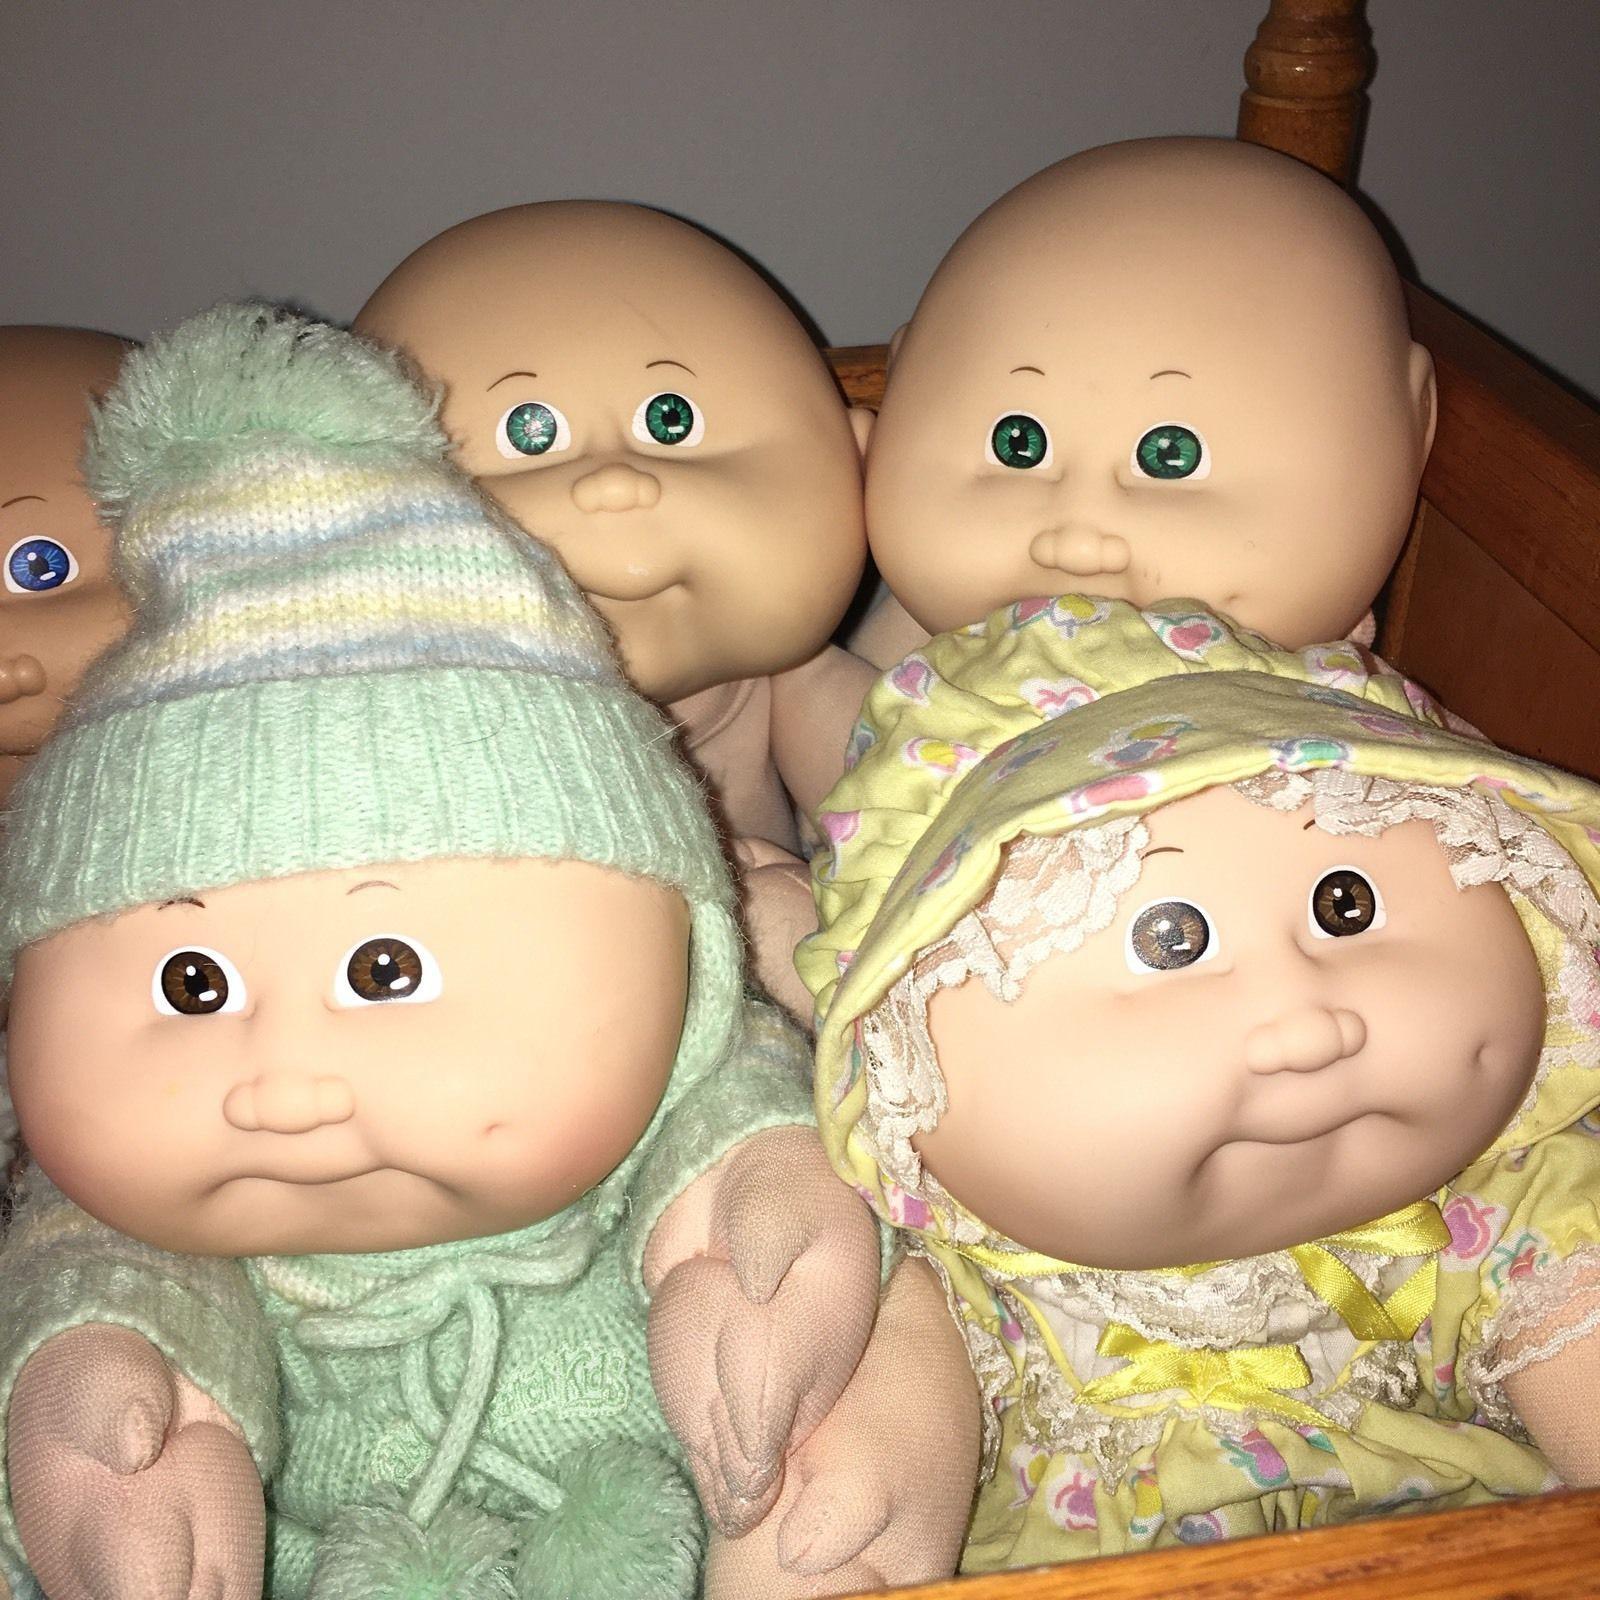 Cabbage Patch Kids Dolls Original Vintage Shoes Ebay Cabbage Patch Kids Cabbage Patch Babies Kids Beanies